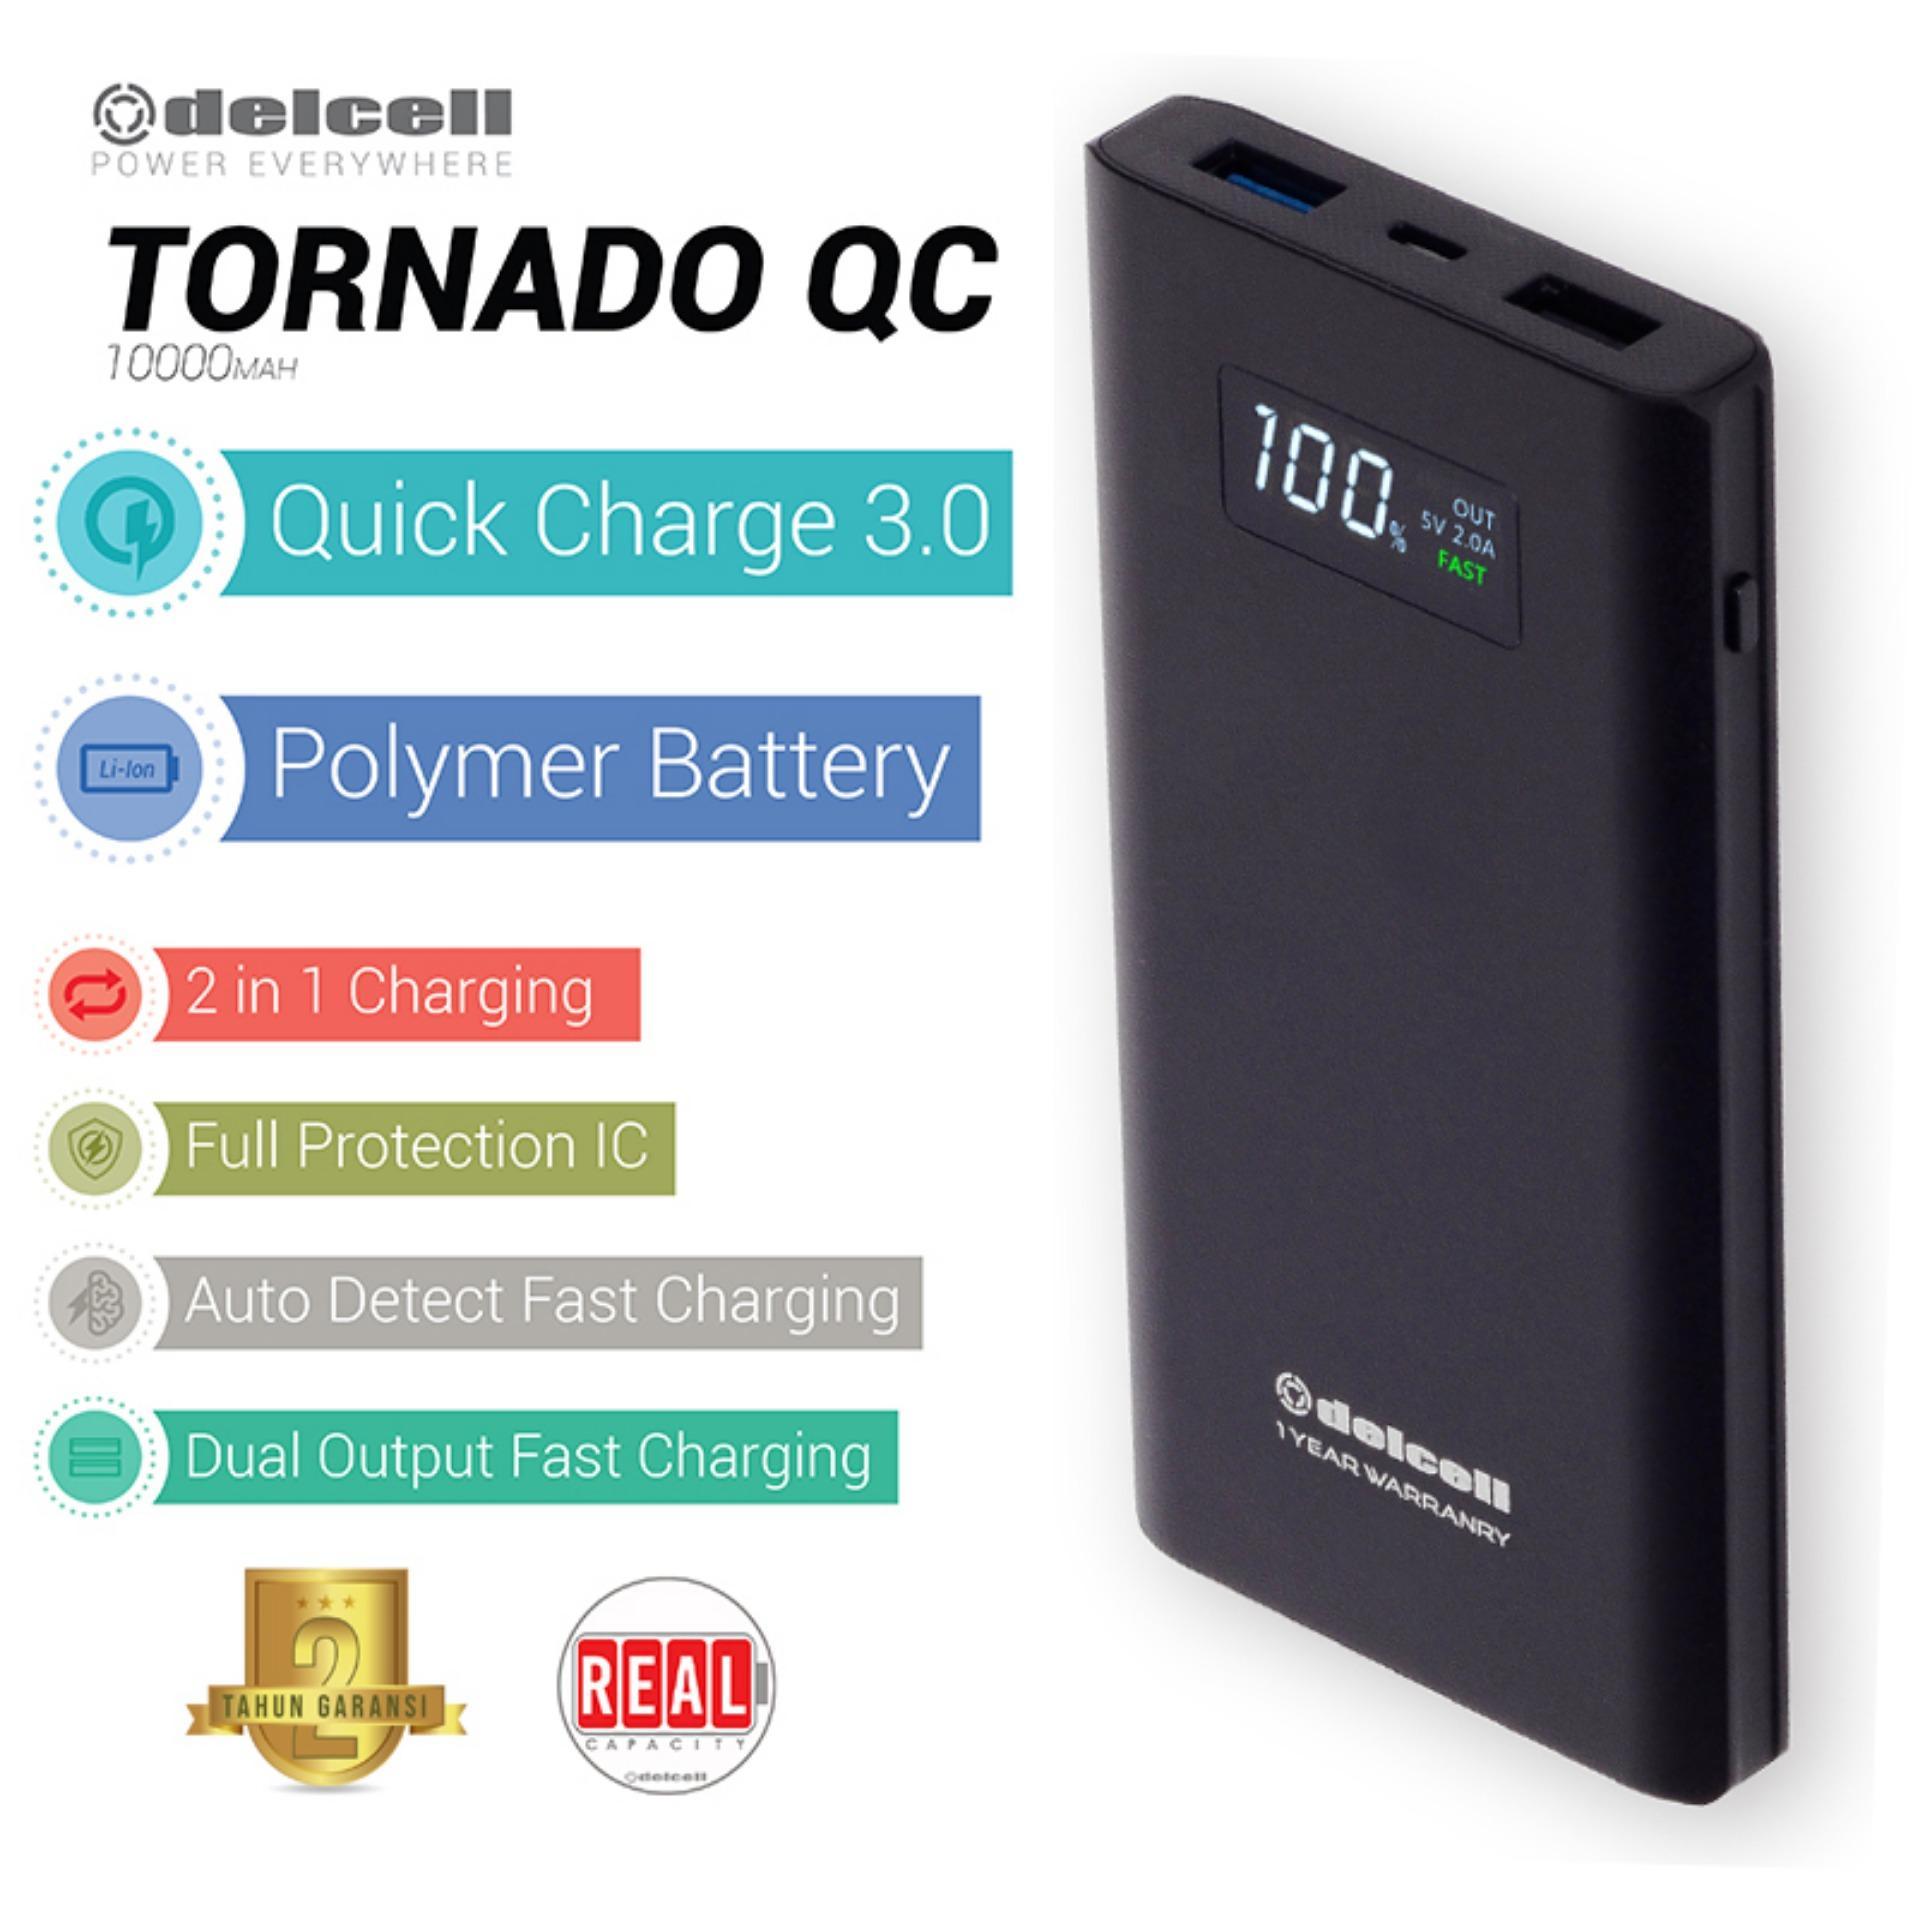 Delcell 10000mAh Powerbank TORNADO Support Quick Charge 3.0A Real Capacity Polymer Battery Slim Powerbank Garansi Resmi 1 Tahun Dual Output Power Bank Berkualitas - Black - Black